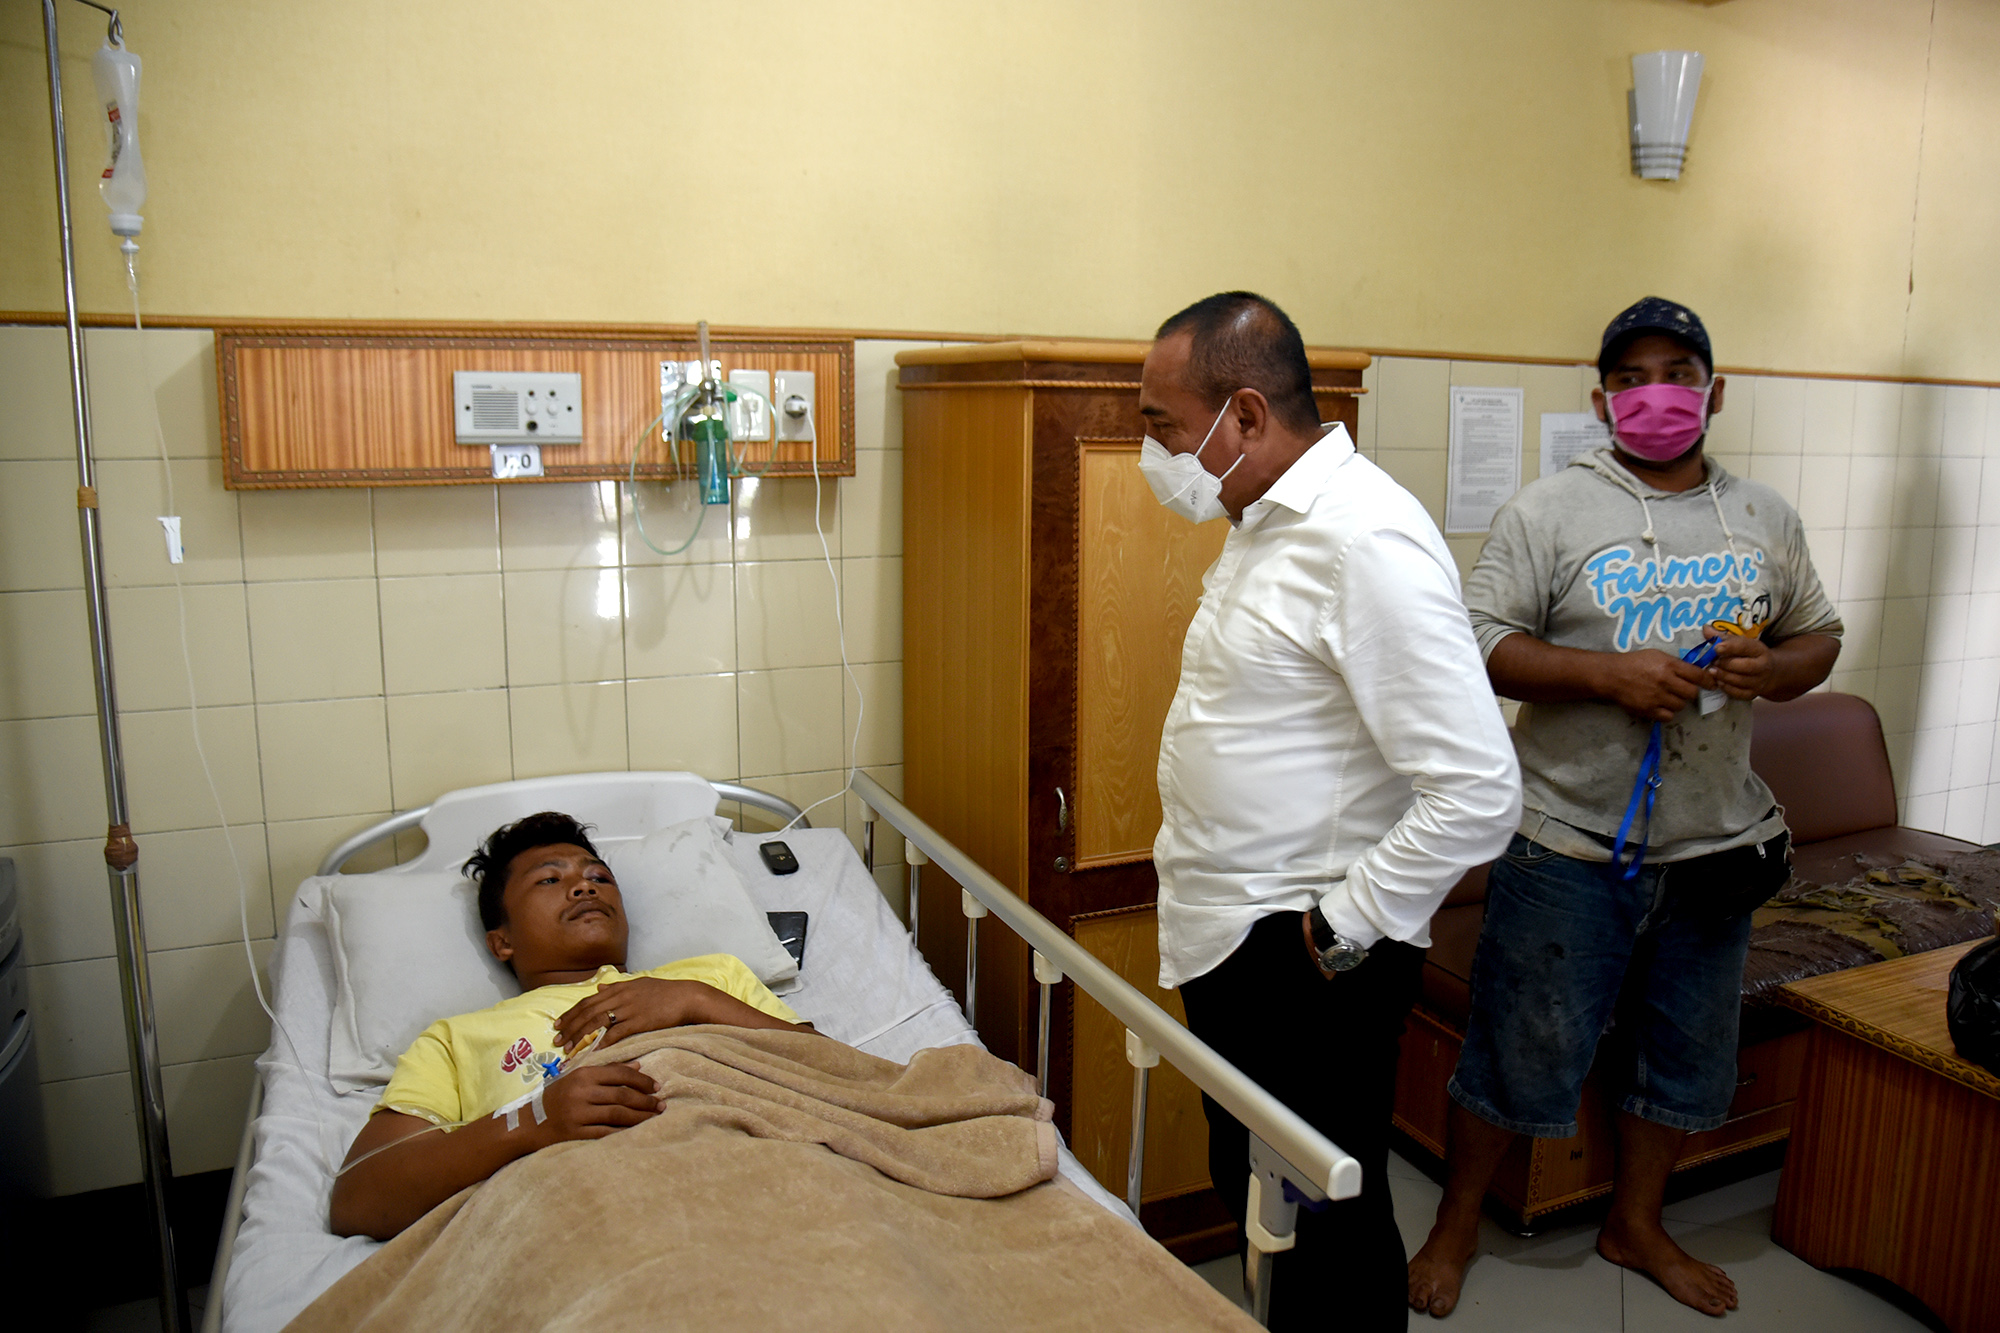 Gubernur Sumut Edy Rahmayadi menjenguk korban selamat banjir bandang Sibiru-biru, Riki Sembiring di Rumah Sakit Sembiring, Kecamatan Delitua, Deliserdang (15/4/2020). Foto: Biro Humas dan Keprotokolan Setdaprovsu/ Fahmi Aulia